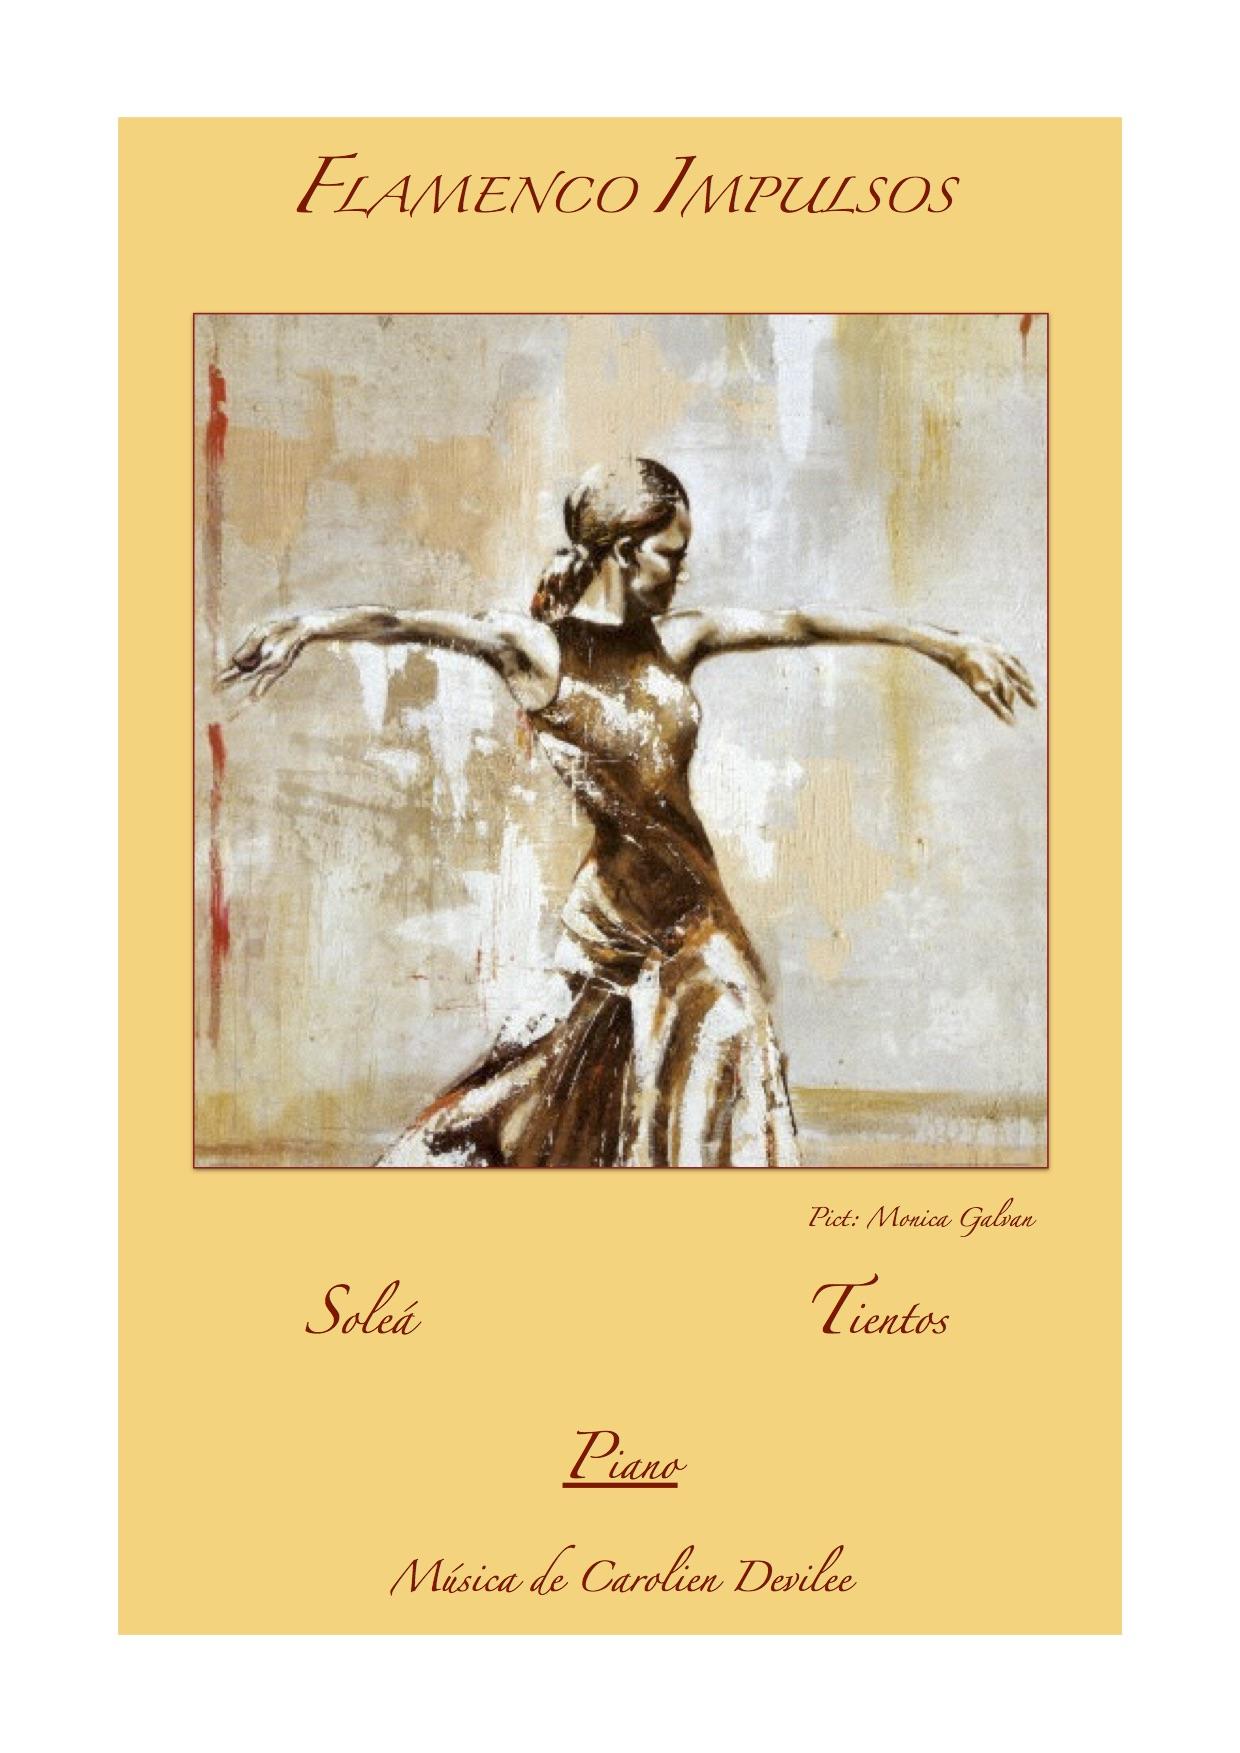 Flamenco Impulsos